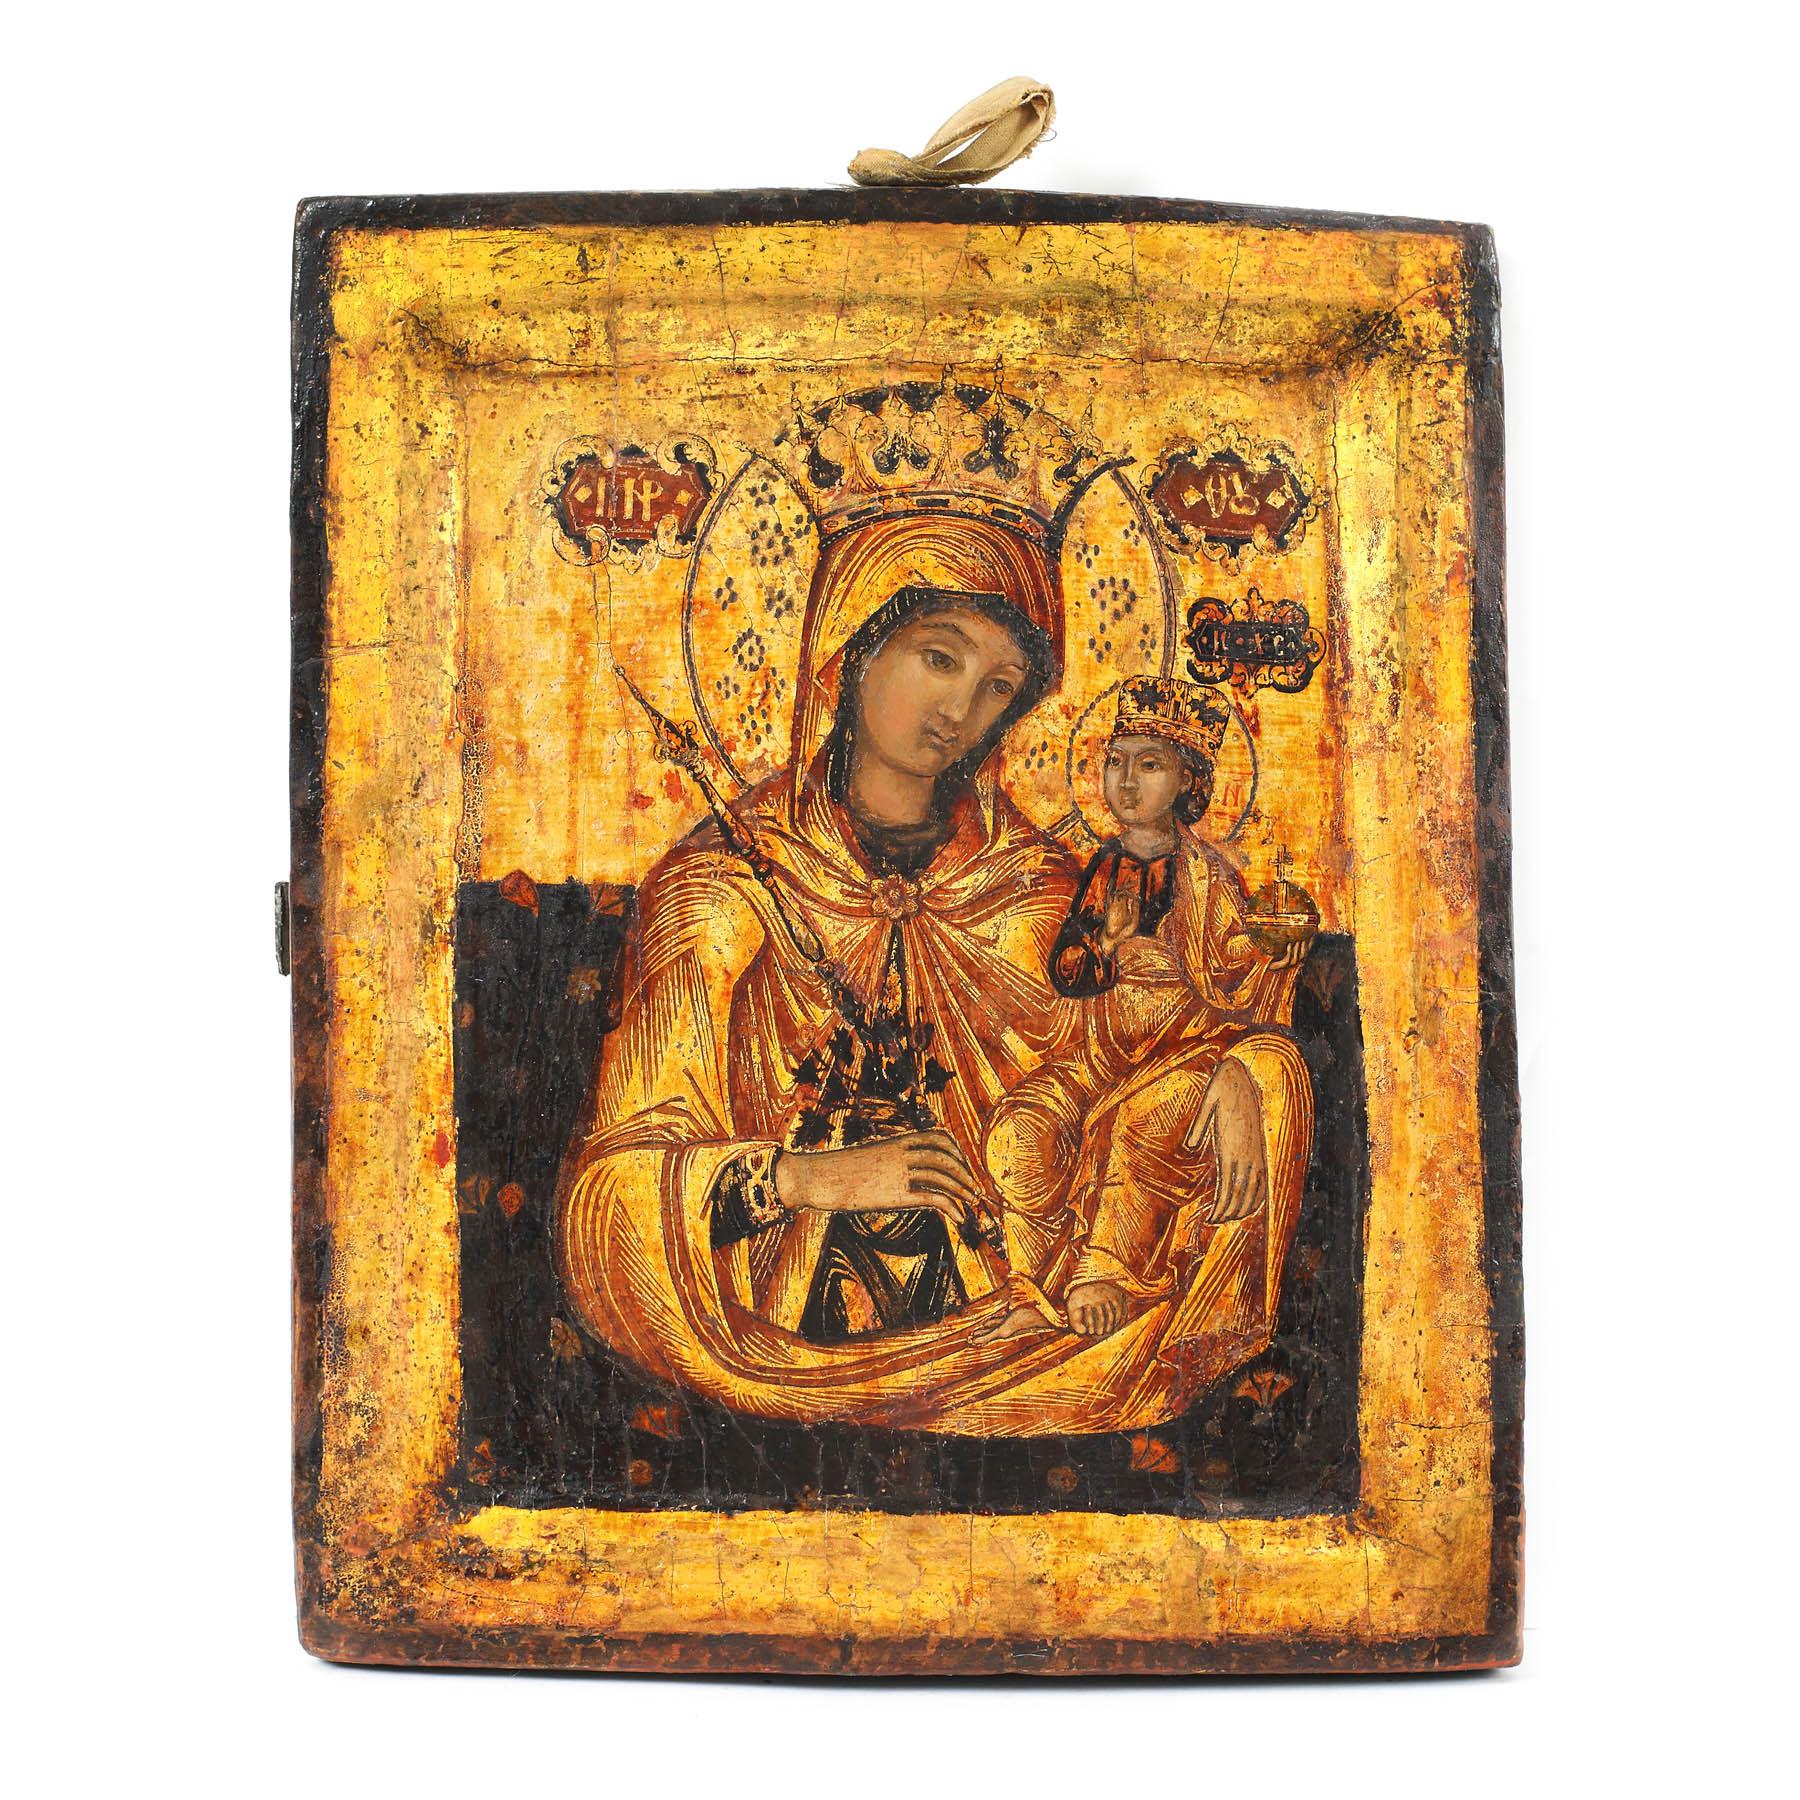 Vente Tradition : Icônes, tapis et art paysan roumain chez A10 by Artmark : 215 lots